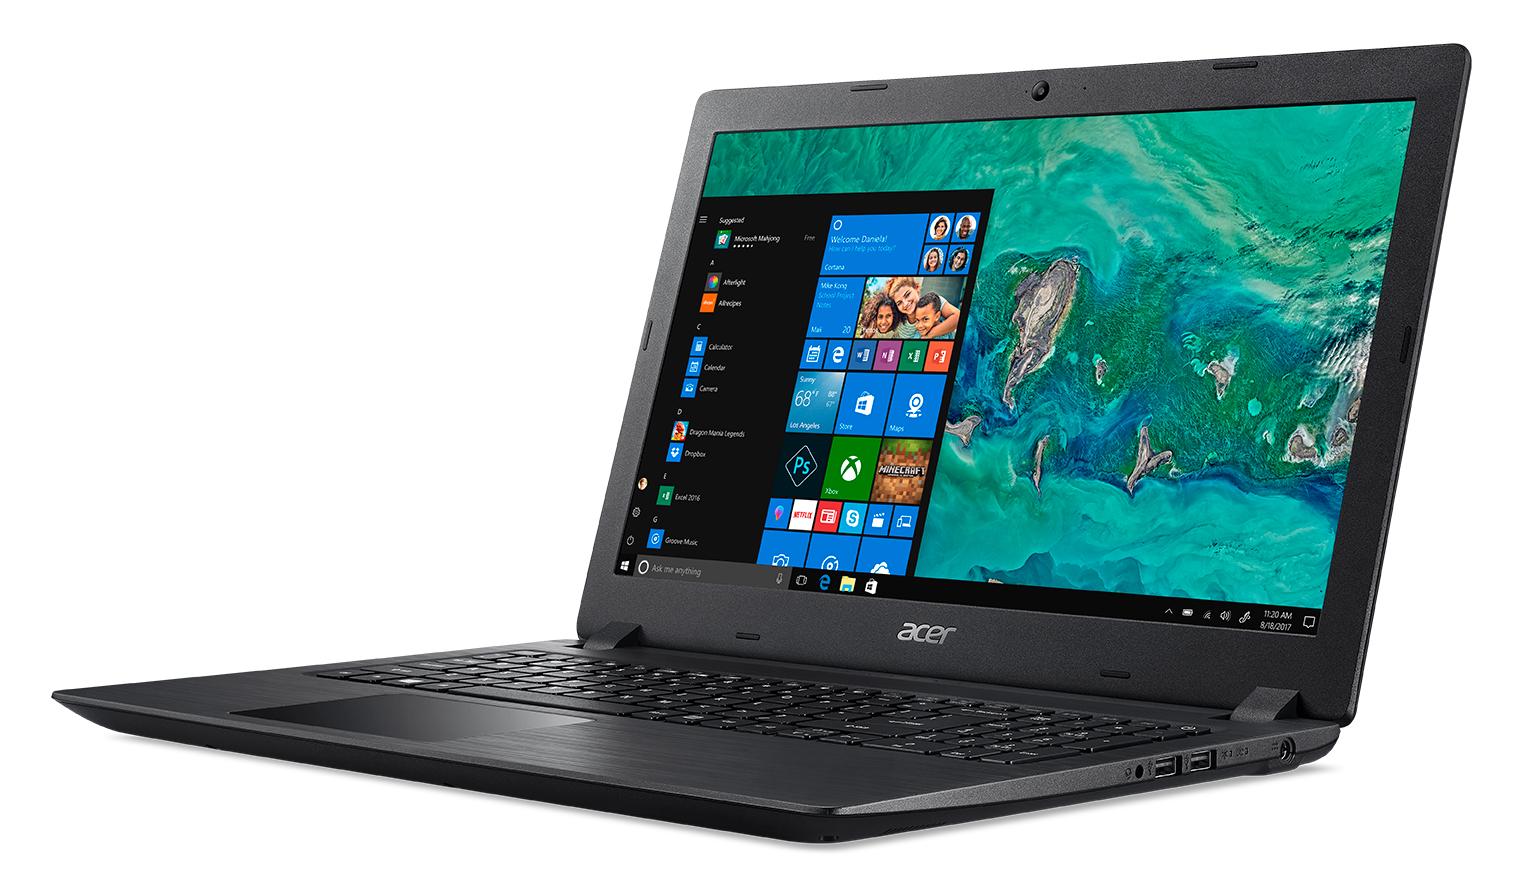 Acer Aspire 3 A315-32-C4Q2, Black, 15.6 inch FHD, Celeron N4000 , 4GB DDR4, 256GB SSD, UHD Graphics 600, HDMI, No ODD, Wi-Fi 5 AC + BT 4.0, 2-cell battery, 0.3MP webcam Win 10 Home